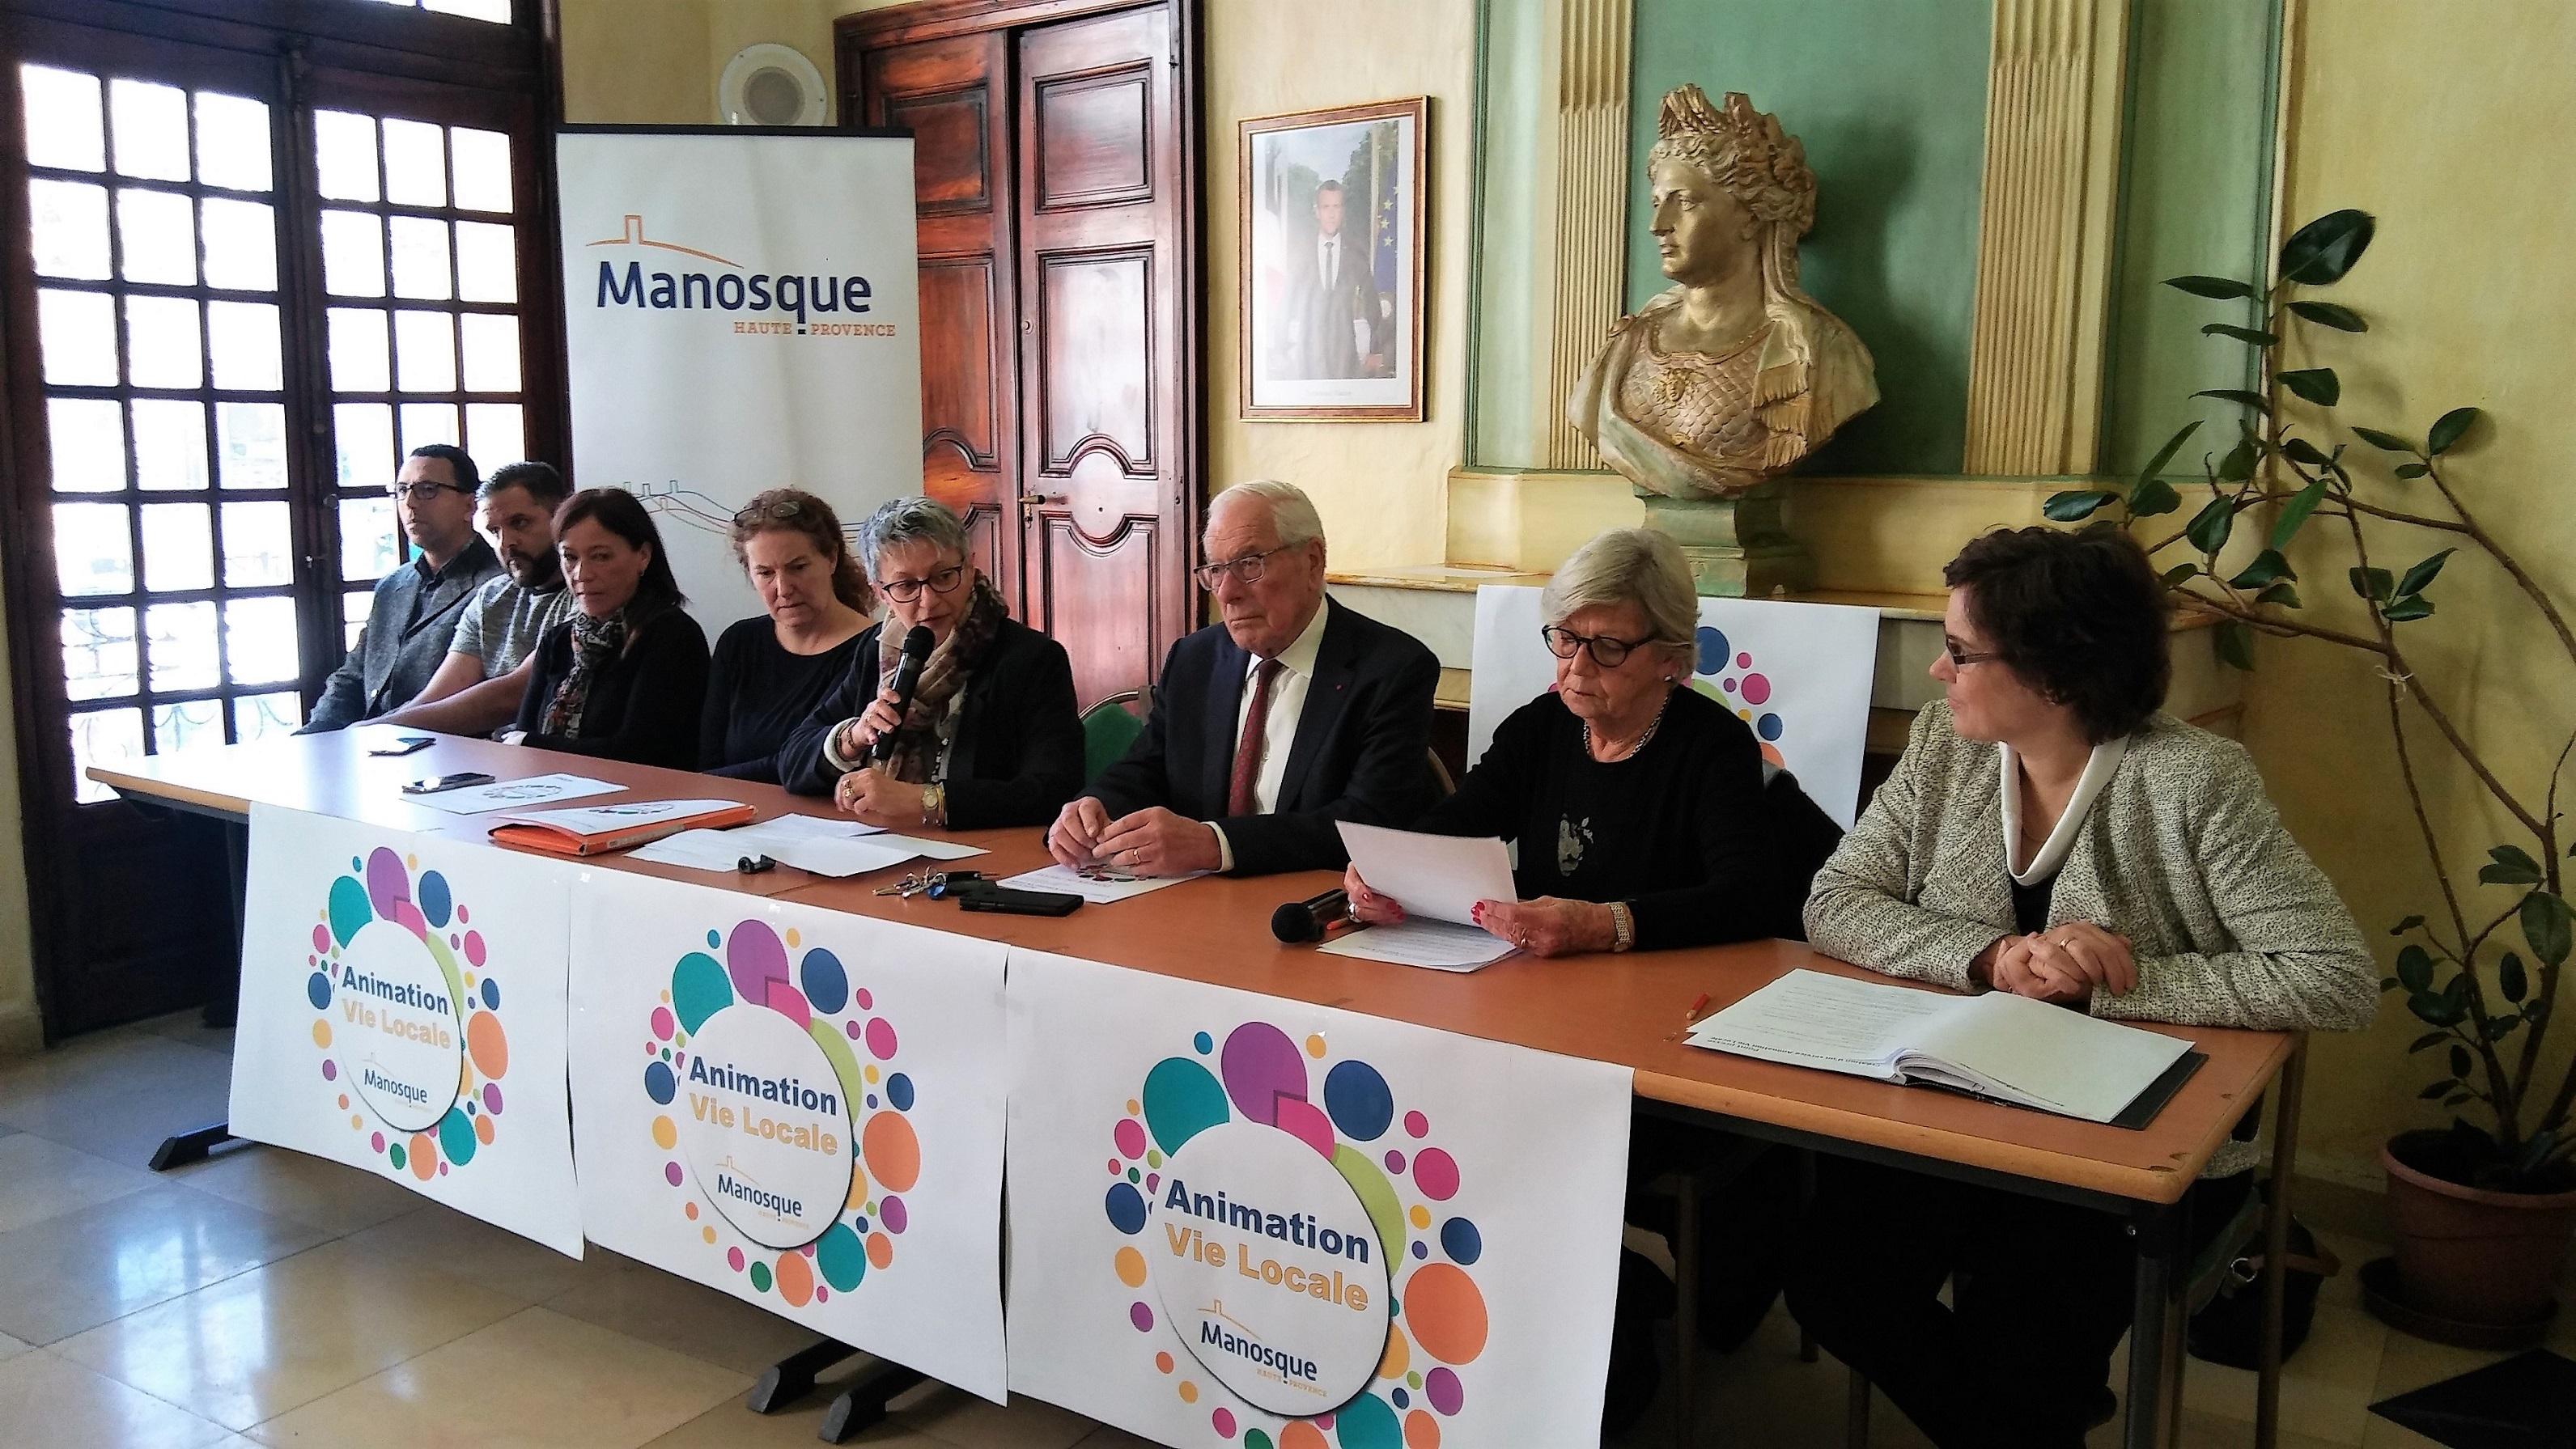 La ville de Manosque entend animer la vie locale